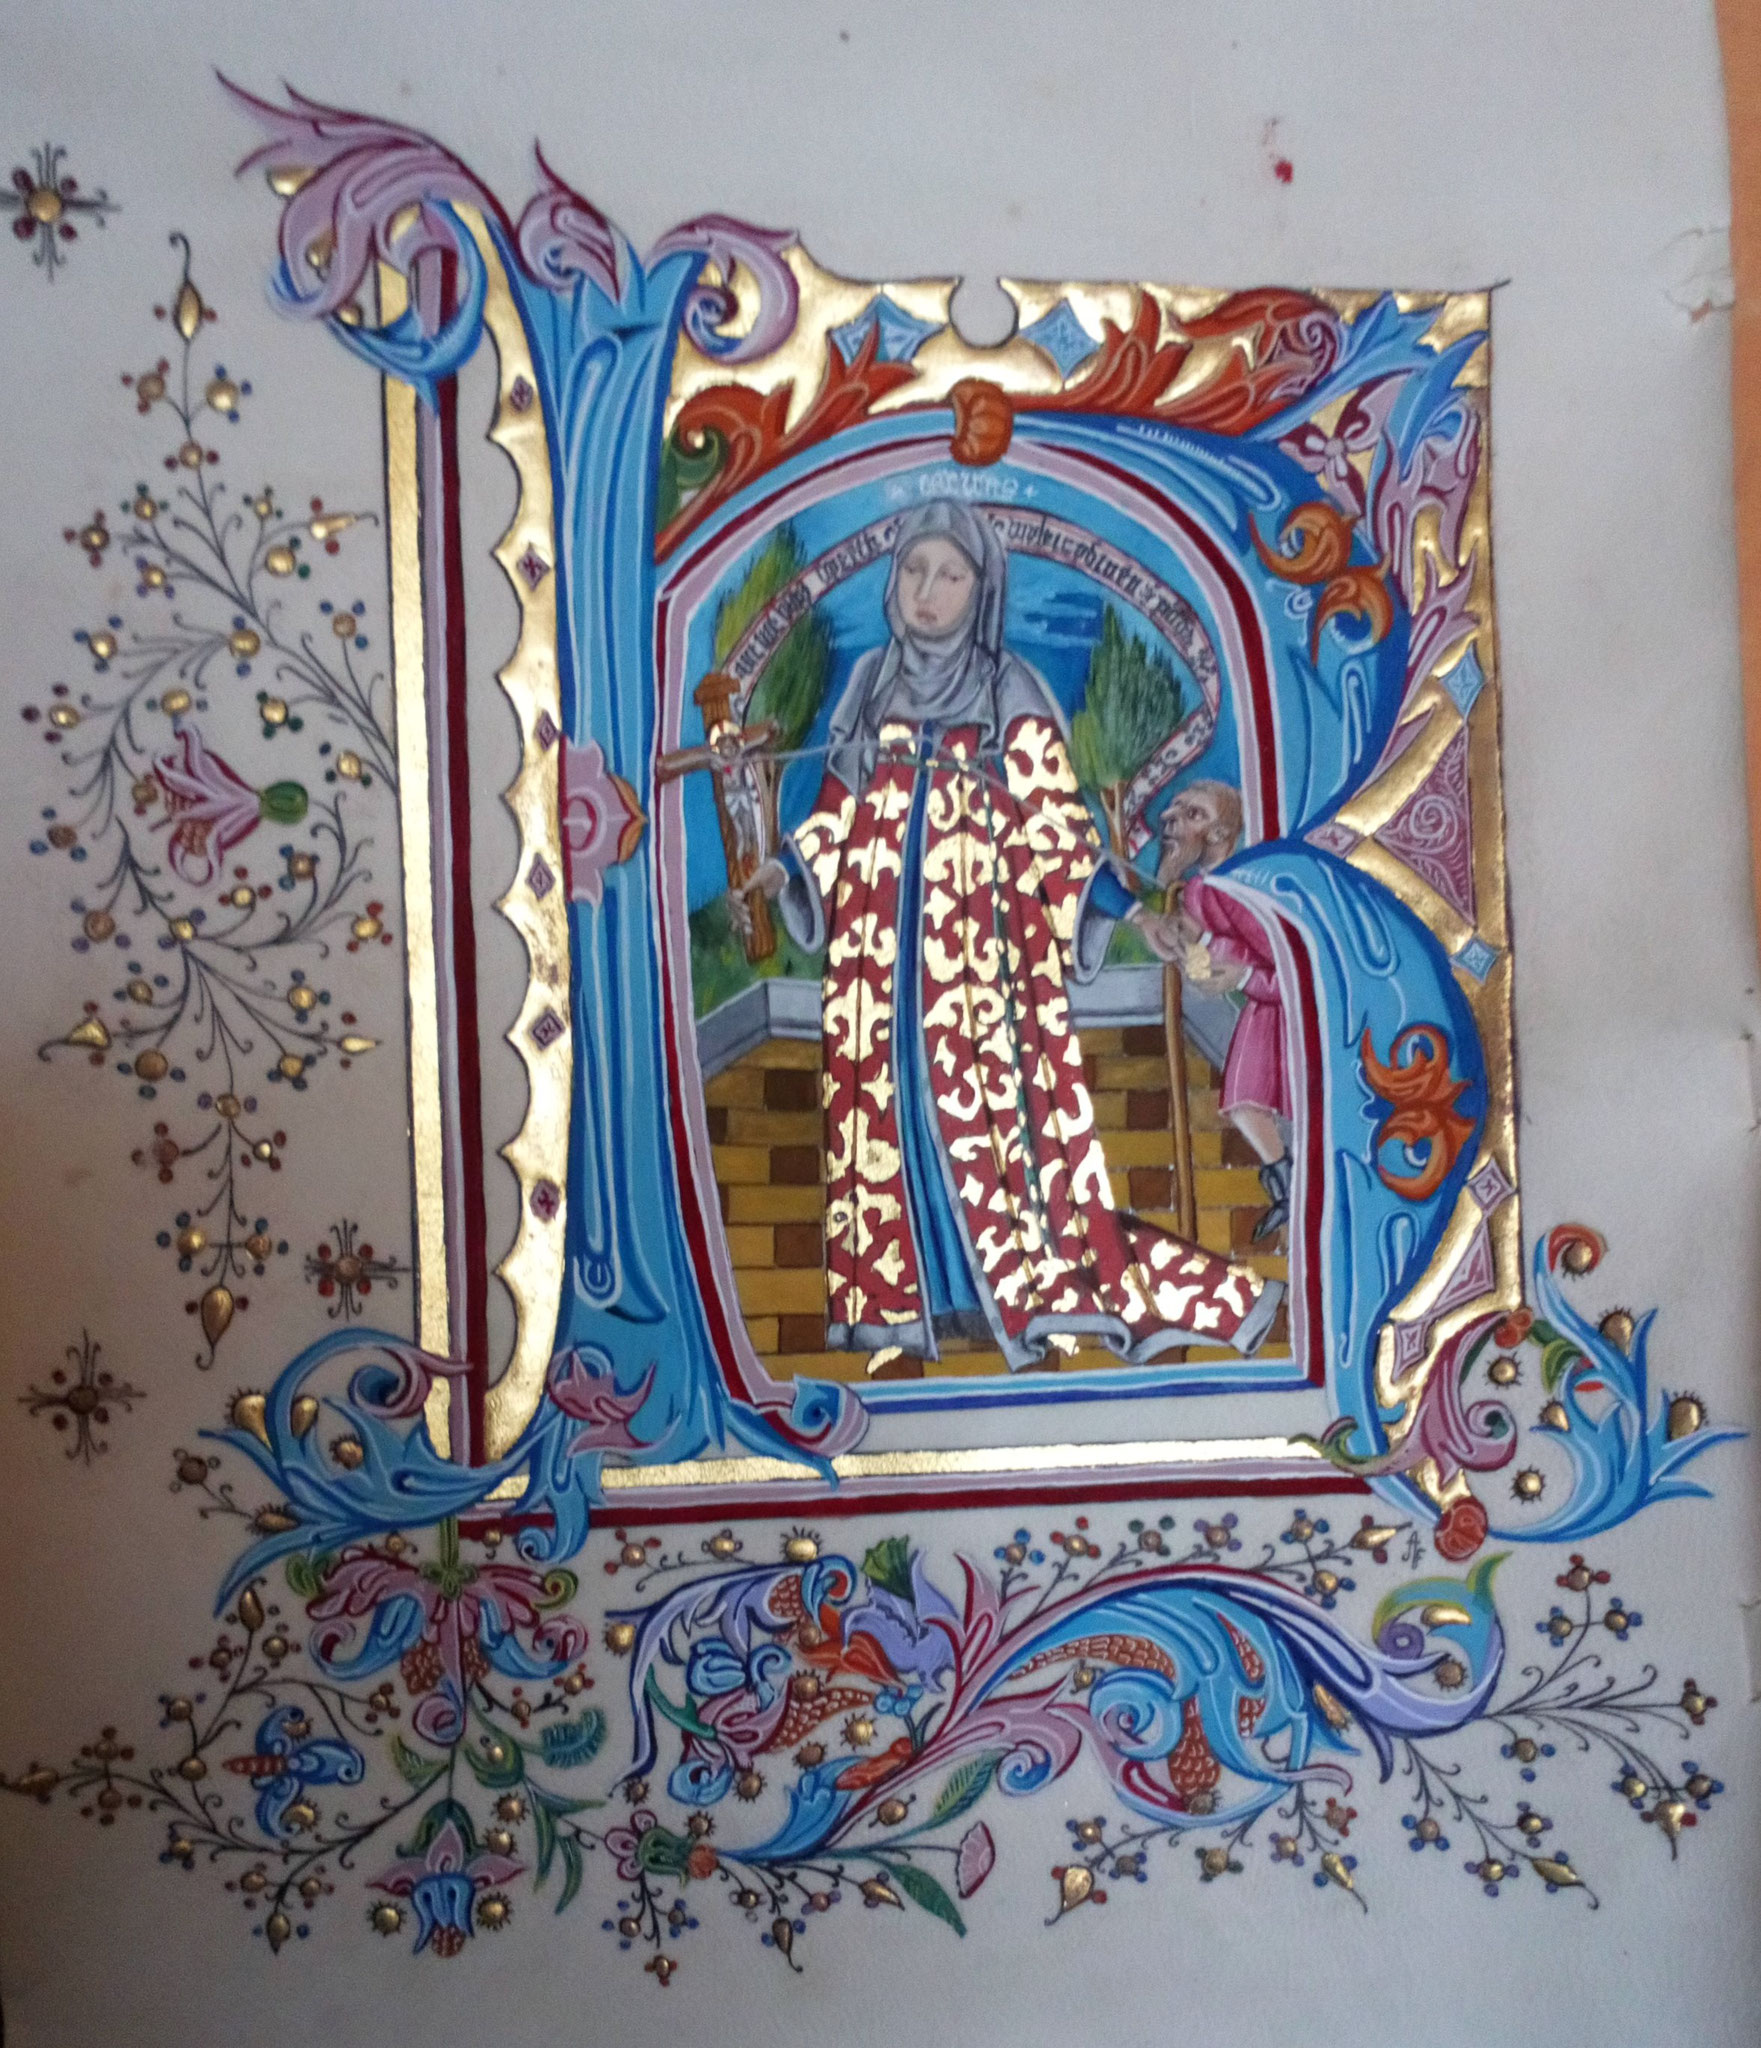 Reproduction , Graduel Espagnol XVe ( Getty Museum Ms 15)  Encadrement galerie Cheloudiakoff  Belfort (me contacter)